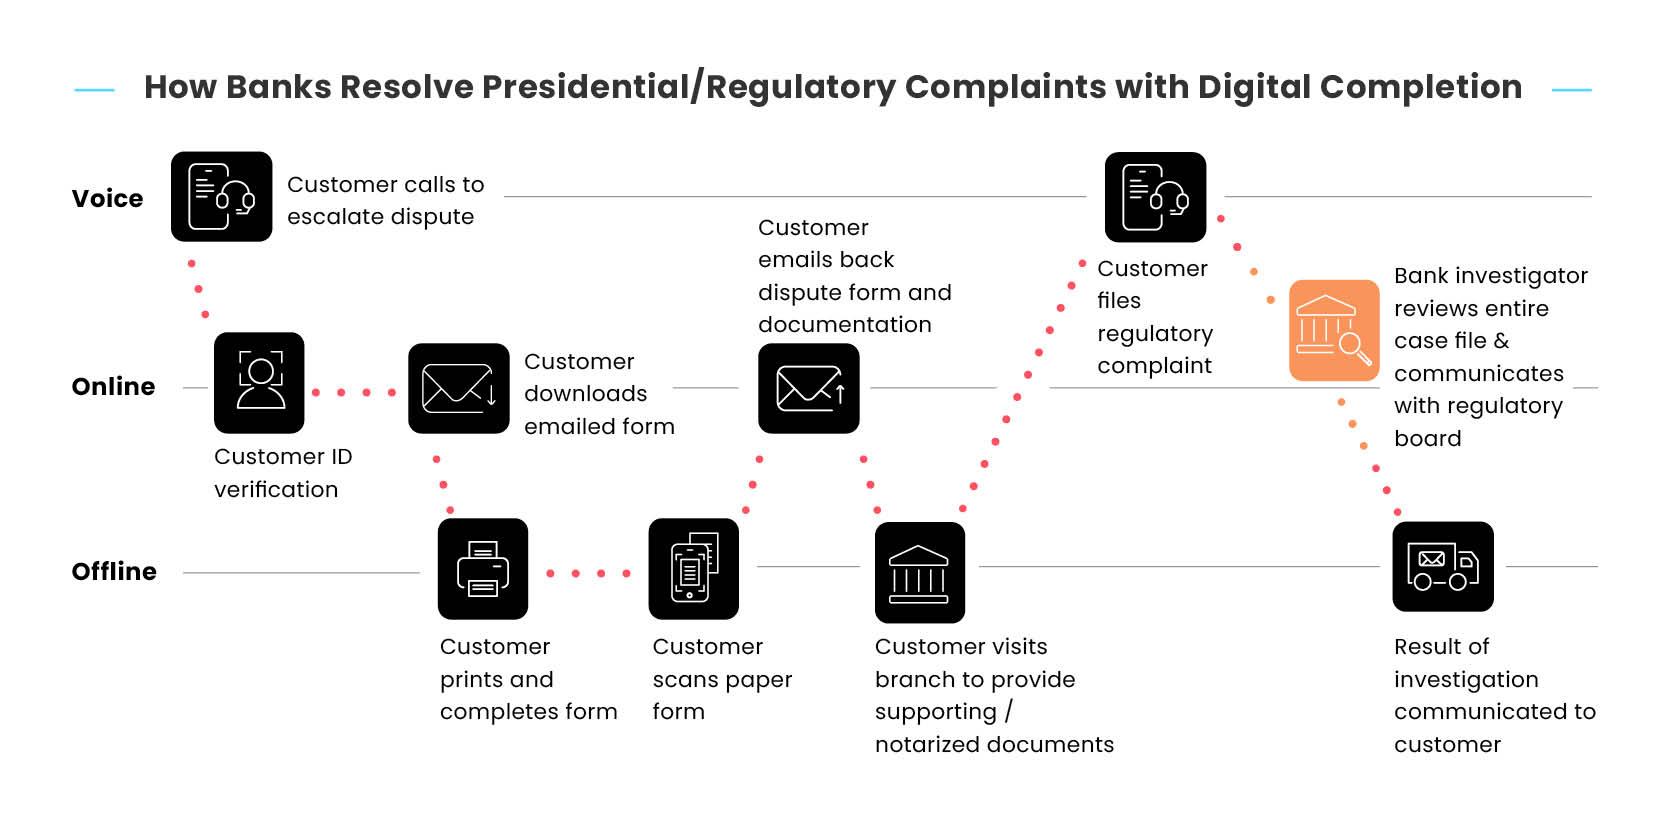 broken-journies-blog-images-bankning-How Banks Resolve PresidentialRegulatory Complaints with Digital Completion